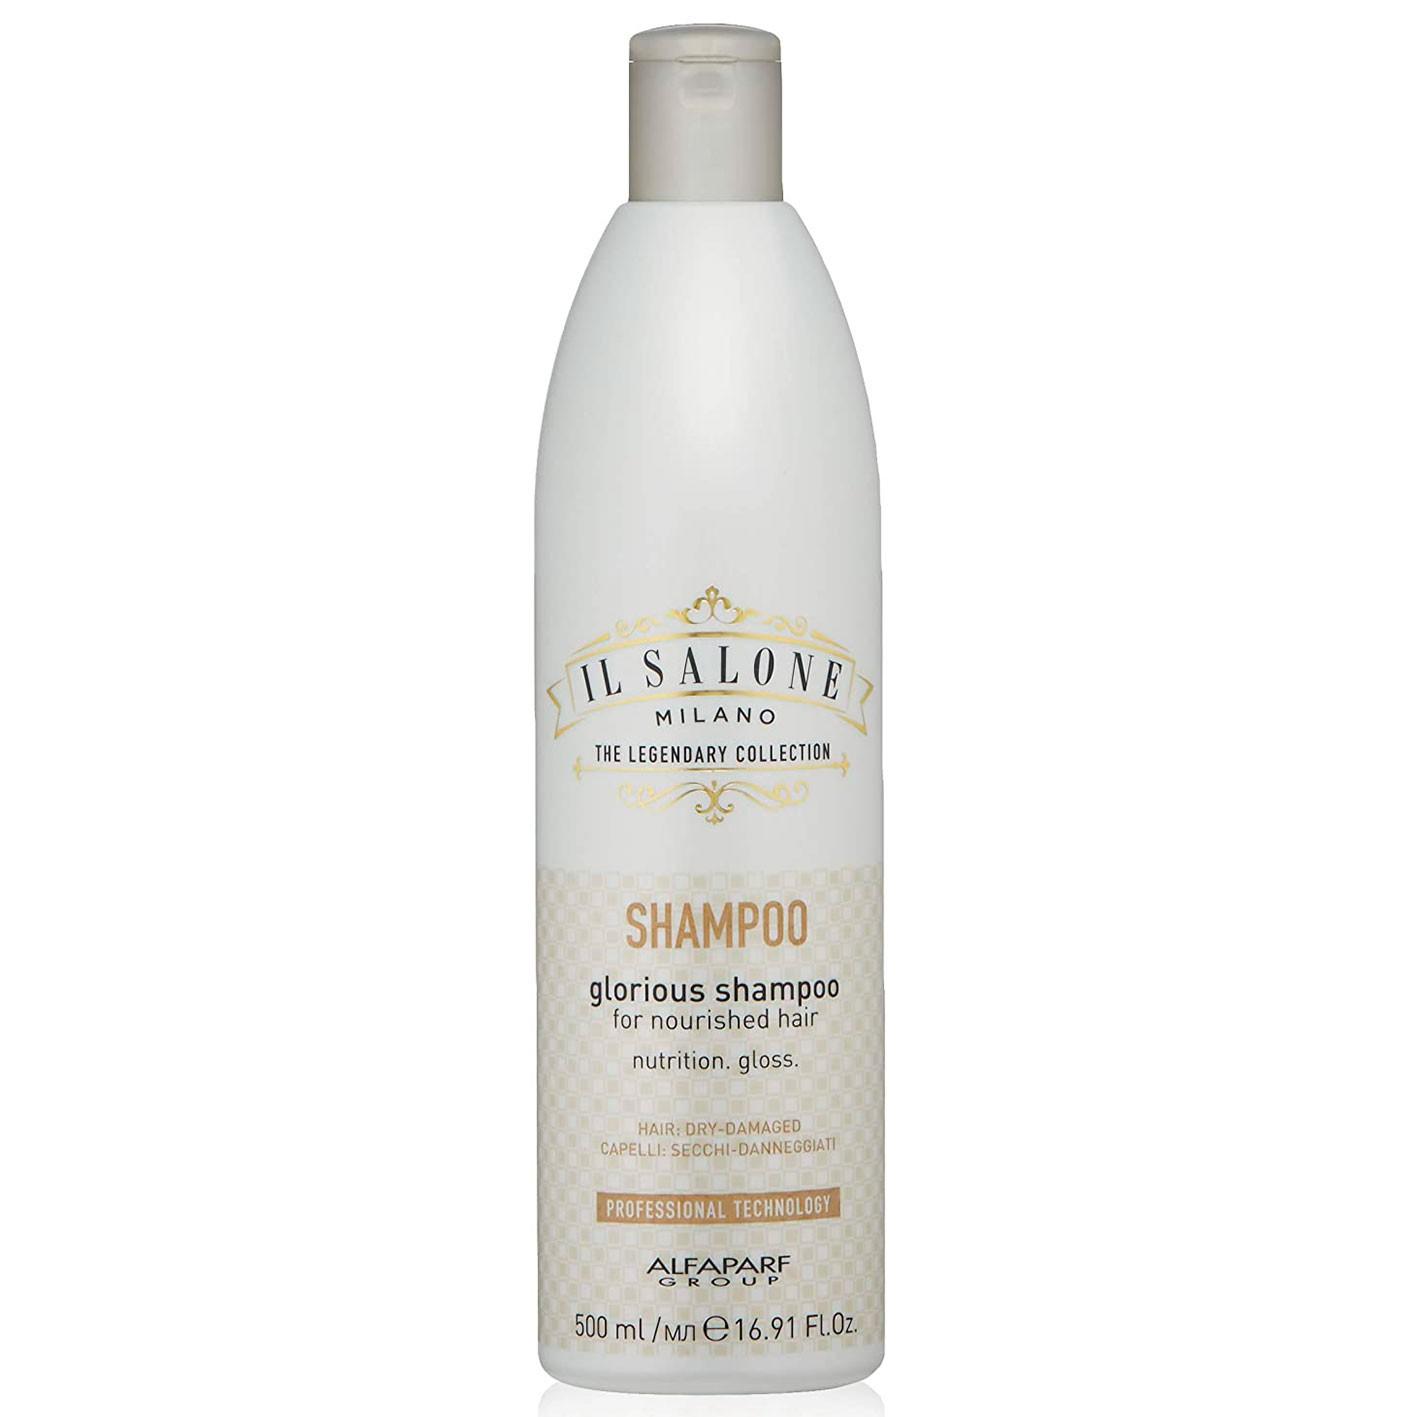 Il Salone Milano Glorious Shampoo Alfaparf Milano 500 ml